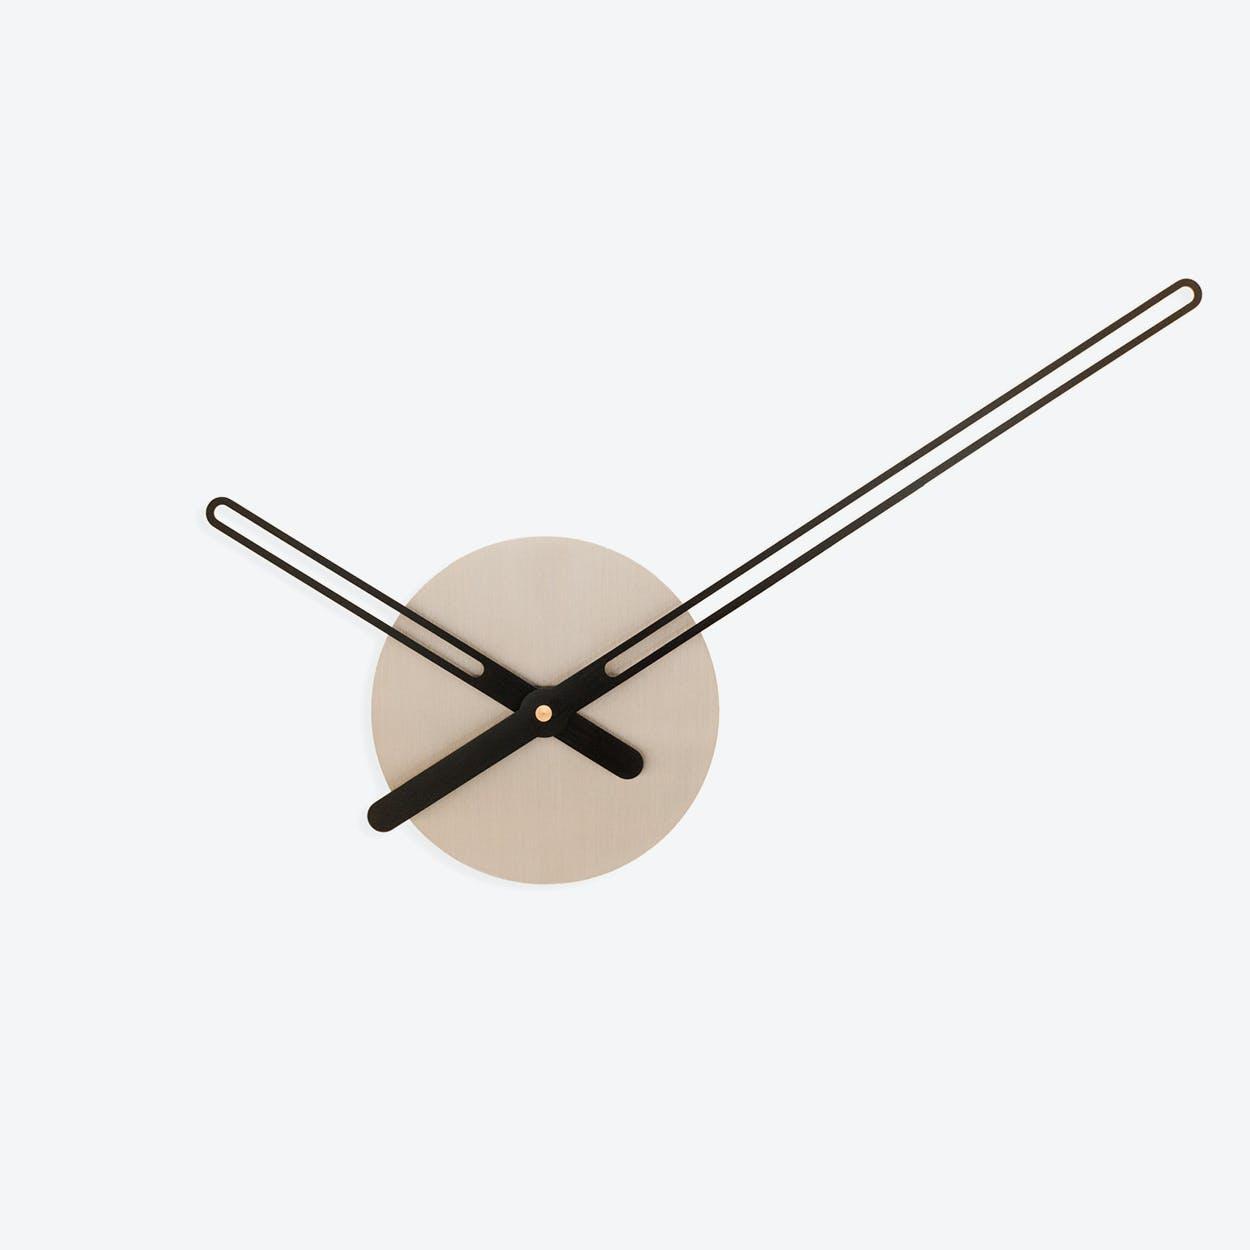 Sweep Wall Clock - Stainless Steel & Black